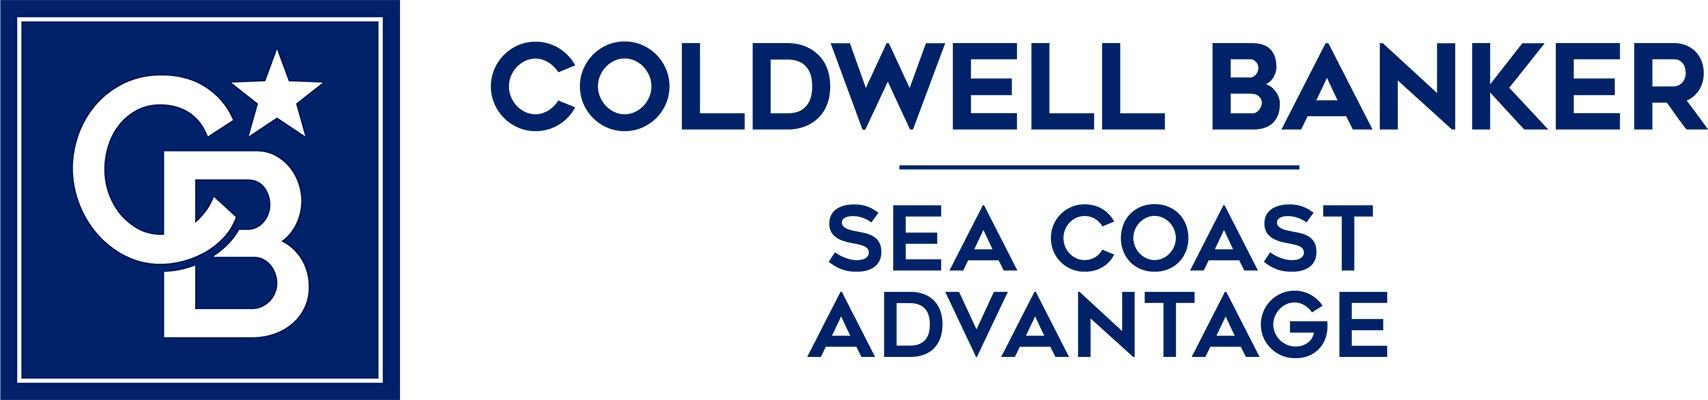 Laura Mathis - Coldwell Banker Sea Coast Advantage Realty Logo